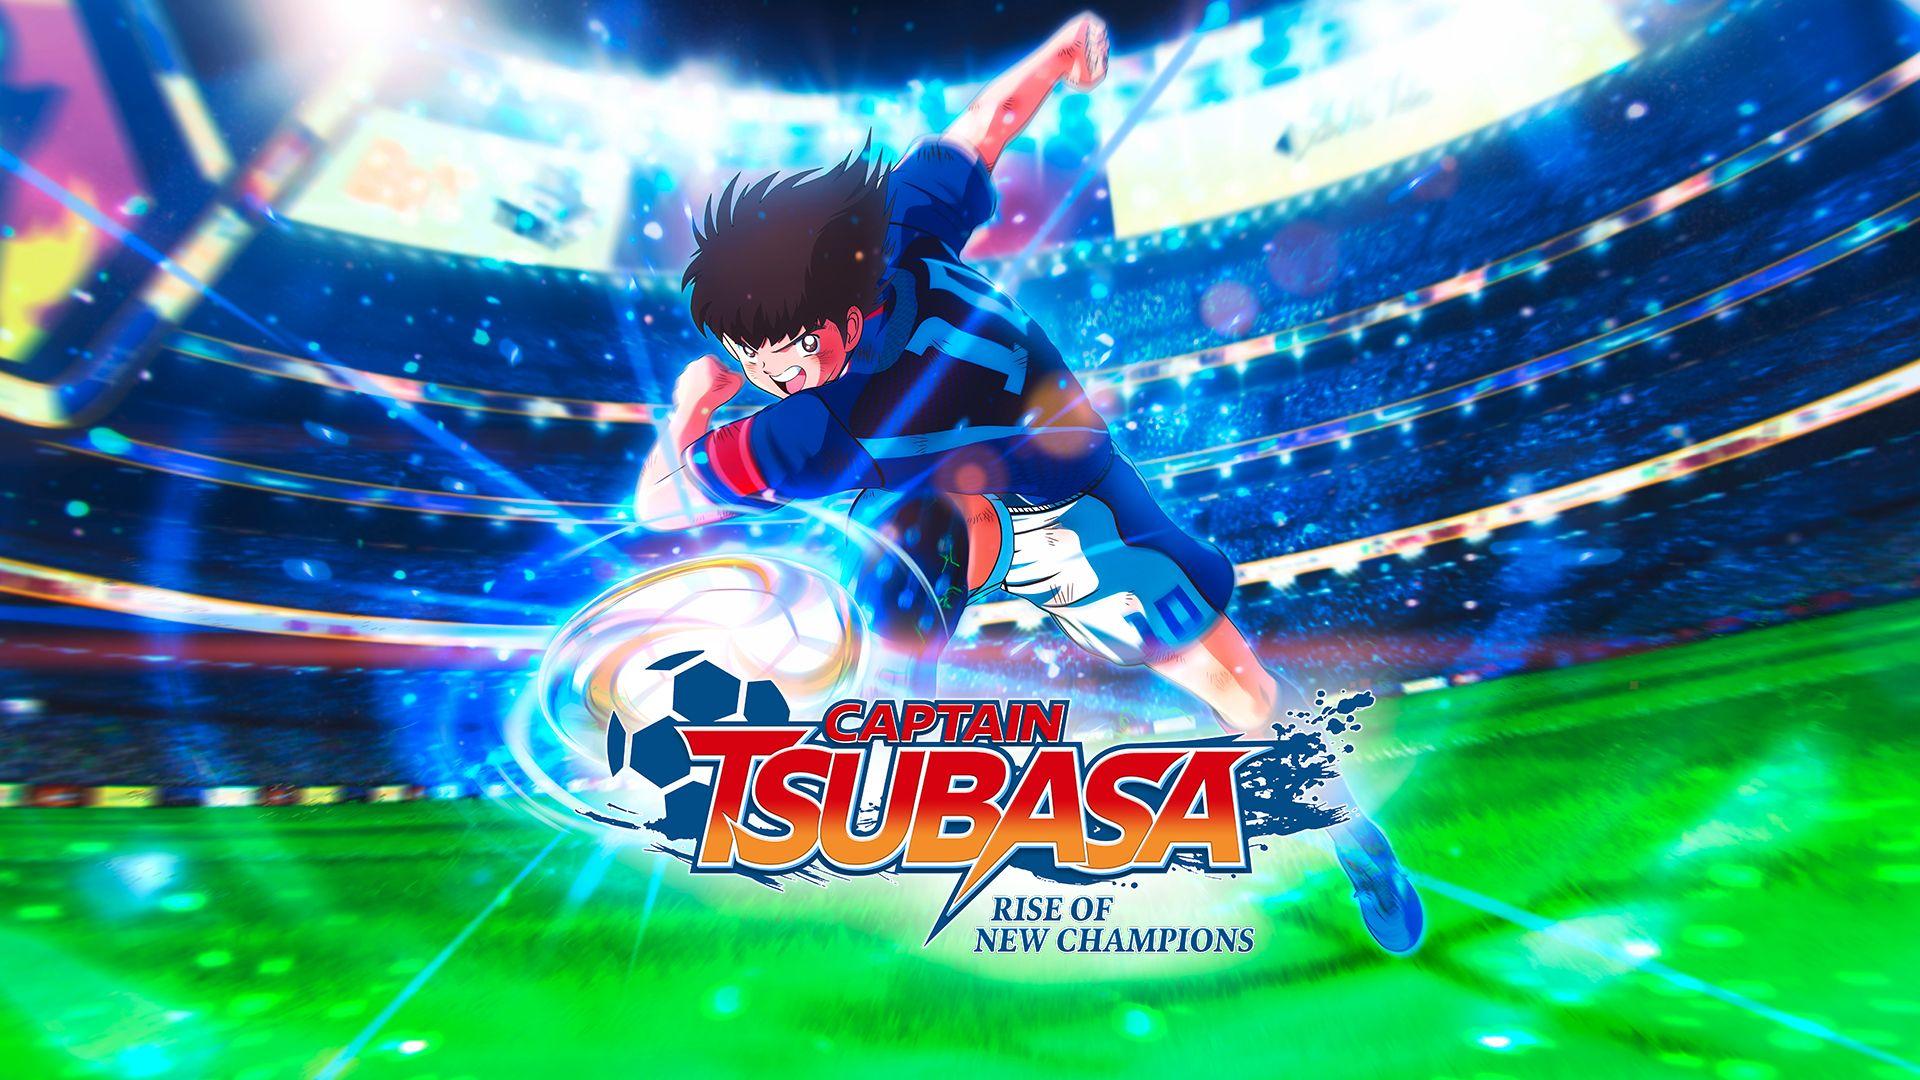 Captain Tsubasa: Rise of New Champions v1.0.1 NSP XCI For Nintendo Switch